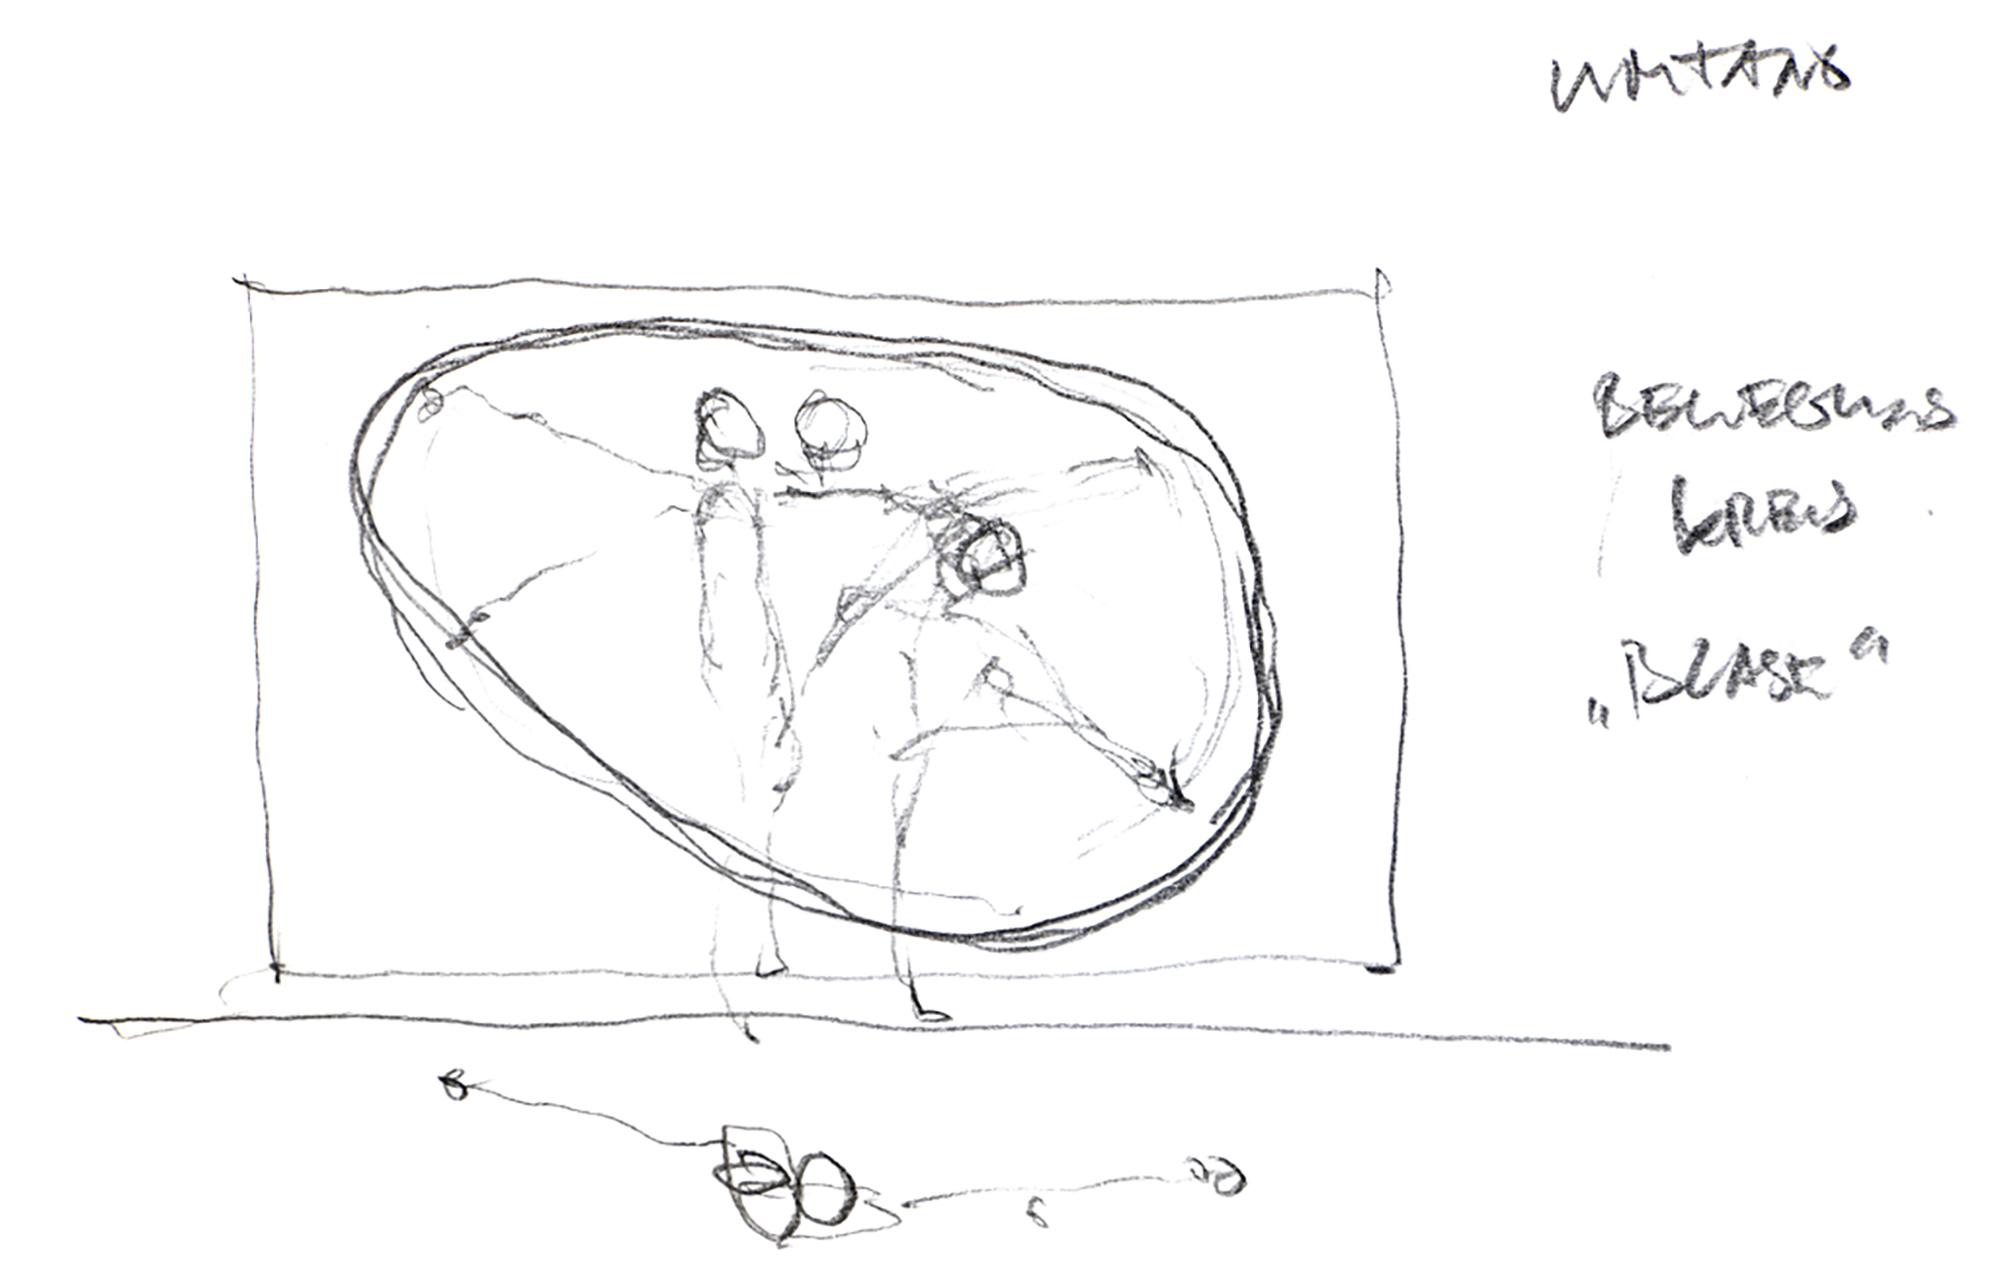 DSC_9017-1024x652 Bodies Drawing